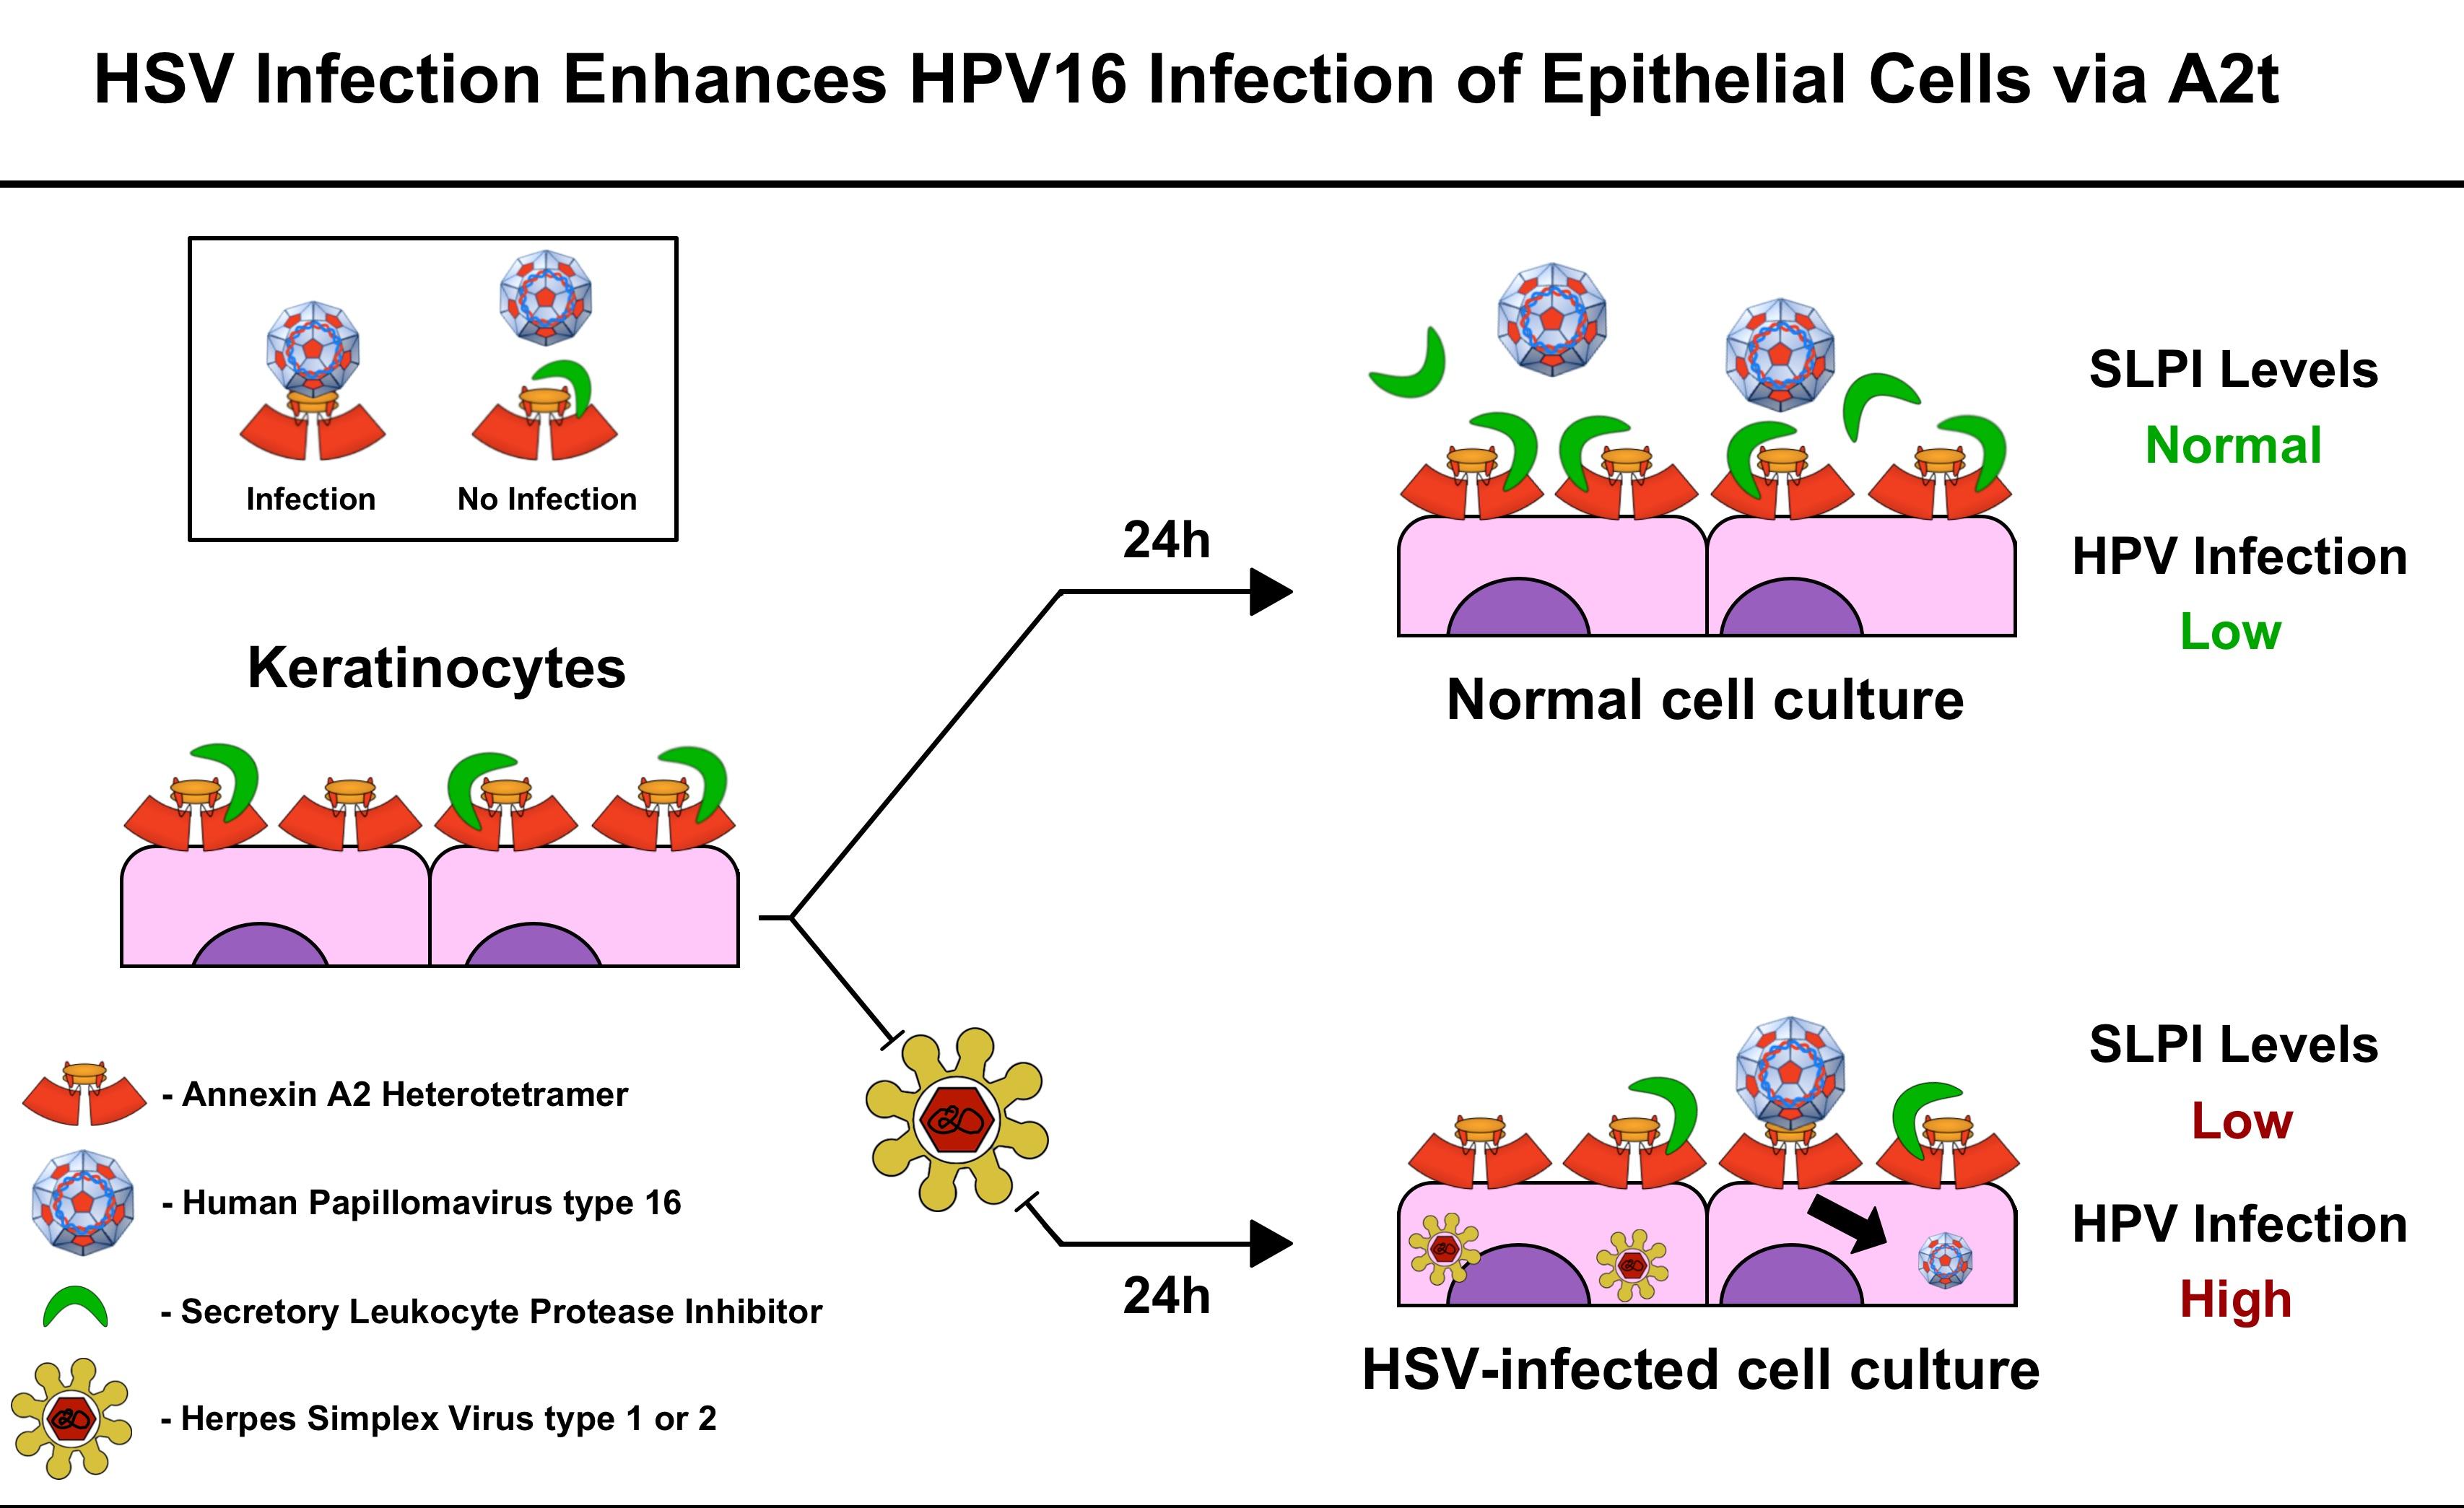 Sanatatea TV: Confuzie Intre HPV Si Herpes Simplex